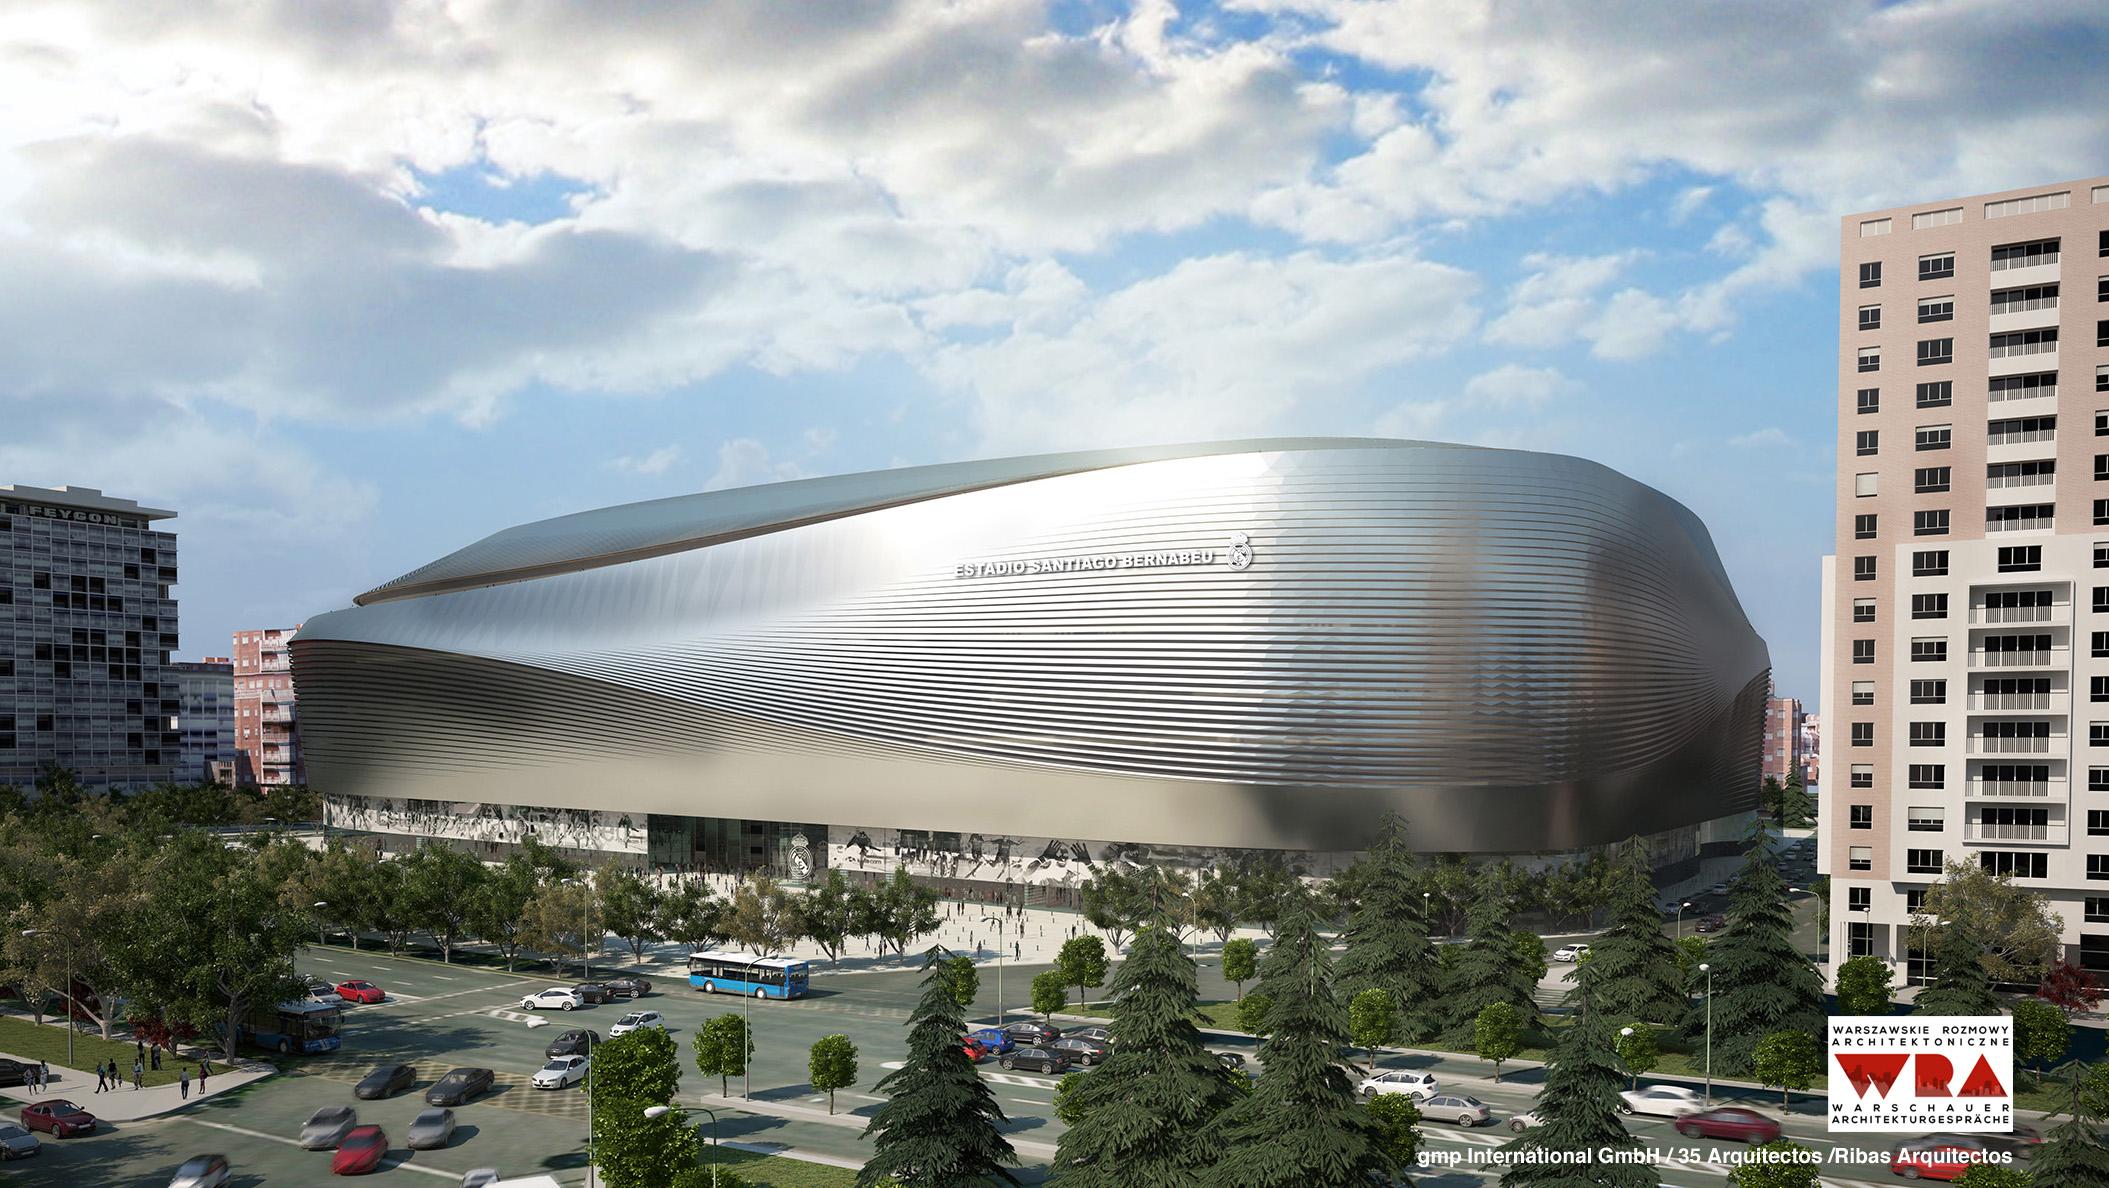 Wizualizacja: Estadio Santiago Bernabéu, proj. gmp International GmbH, 35 Arquitectos, Ribas Arquitectos (źródło: materiały prasowe organizatora)